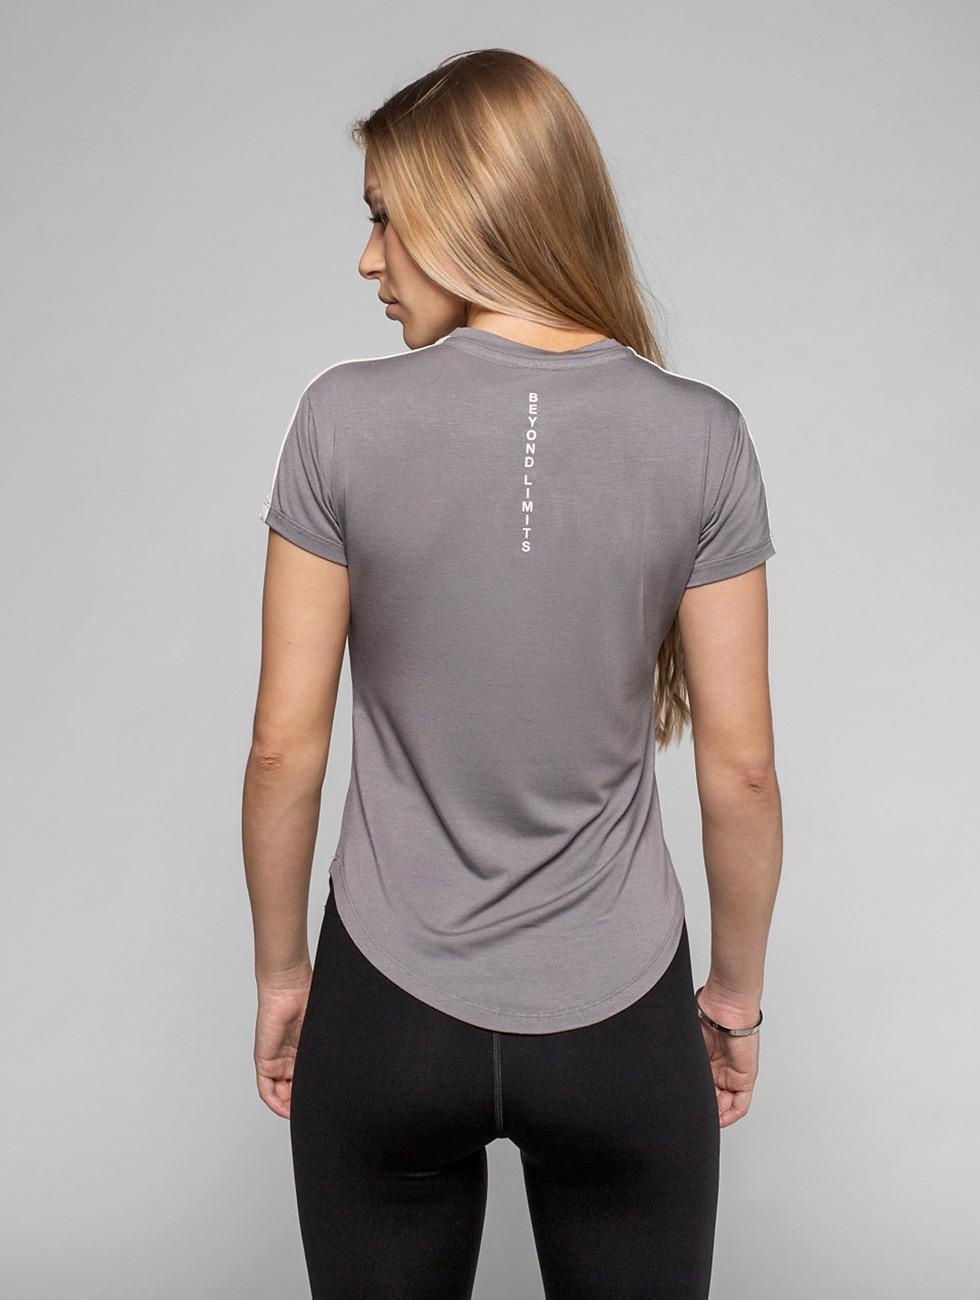 Beyond Limits T-Shirt Statement gray